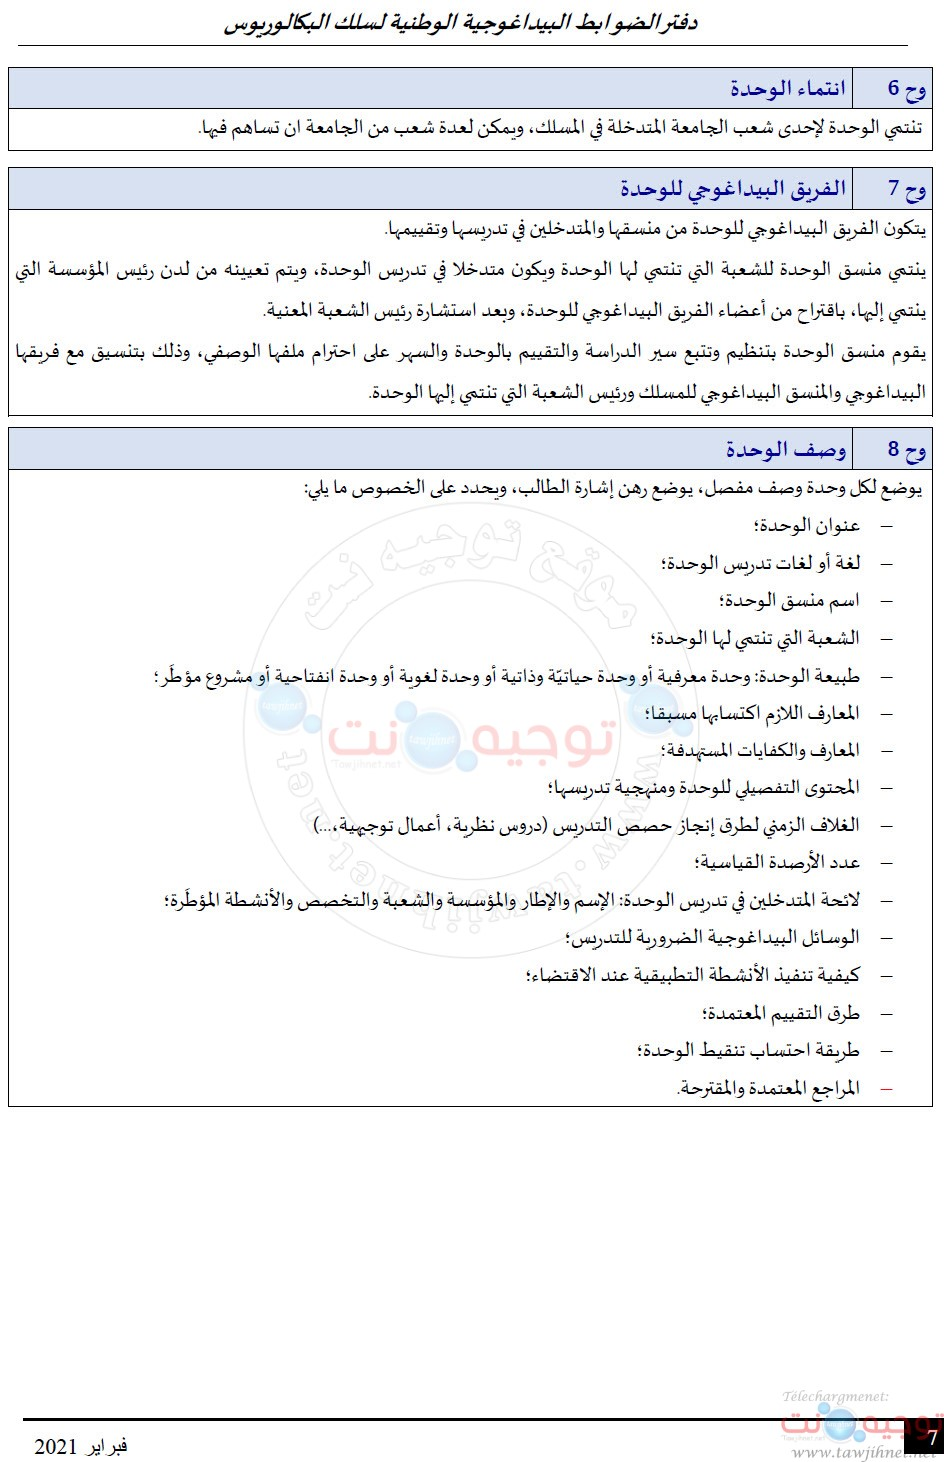 Bachelor-CNPN-normes-pedagoqiques-2021_Page_07.jpg